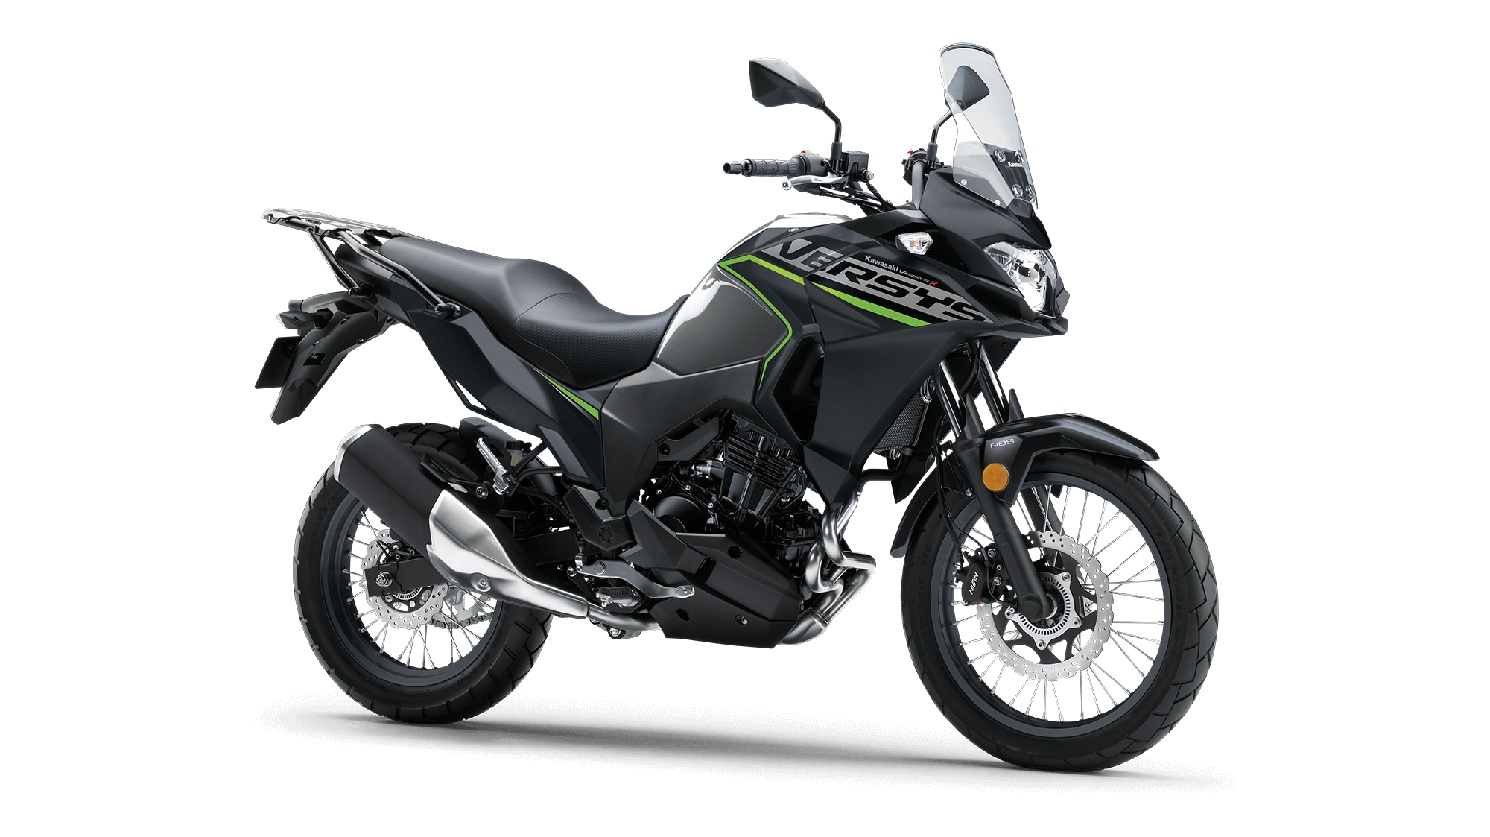 2020 Kawasaki VERSYS-X 300 ABS Metallic Moondust Gray/Metallic Flat Spark Black